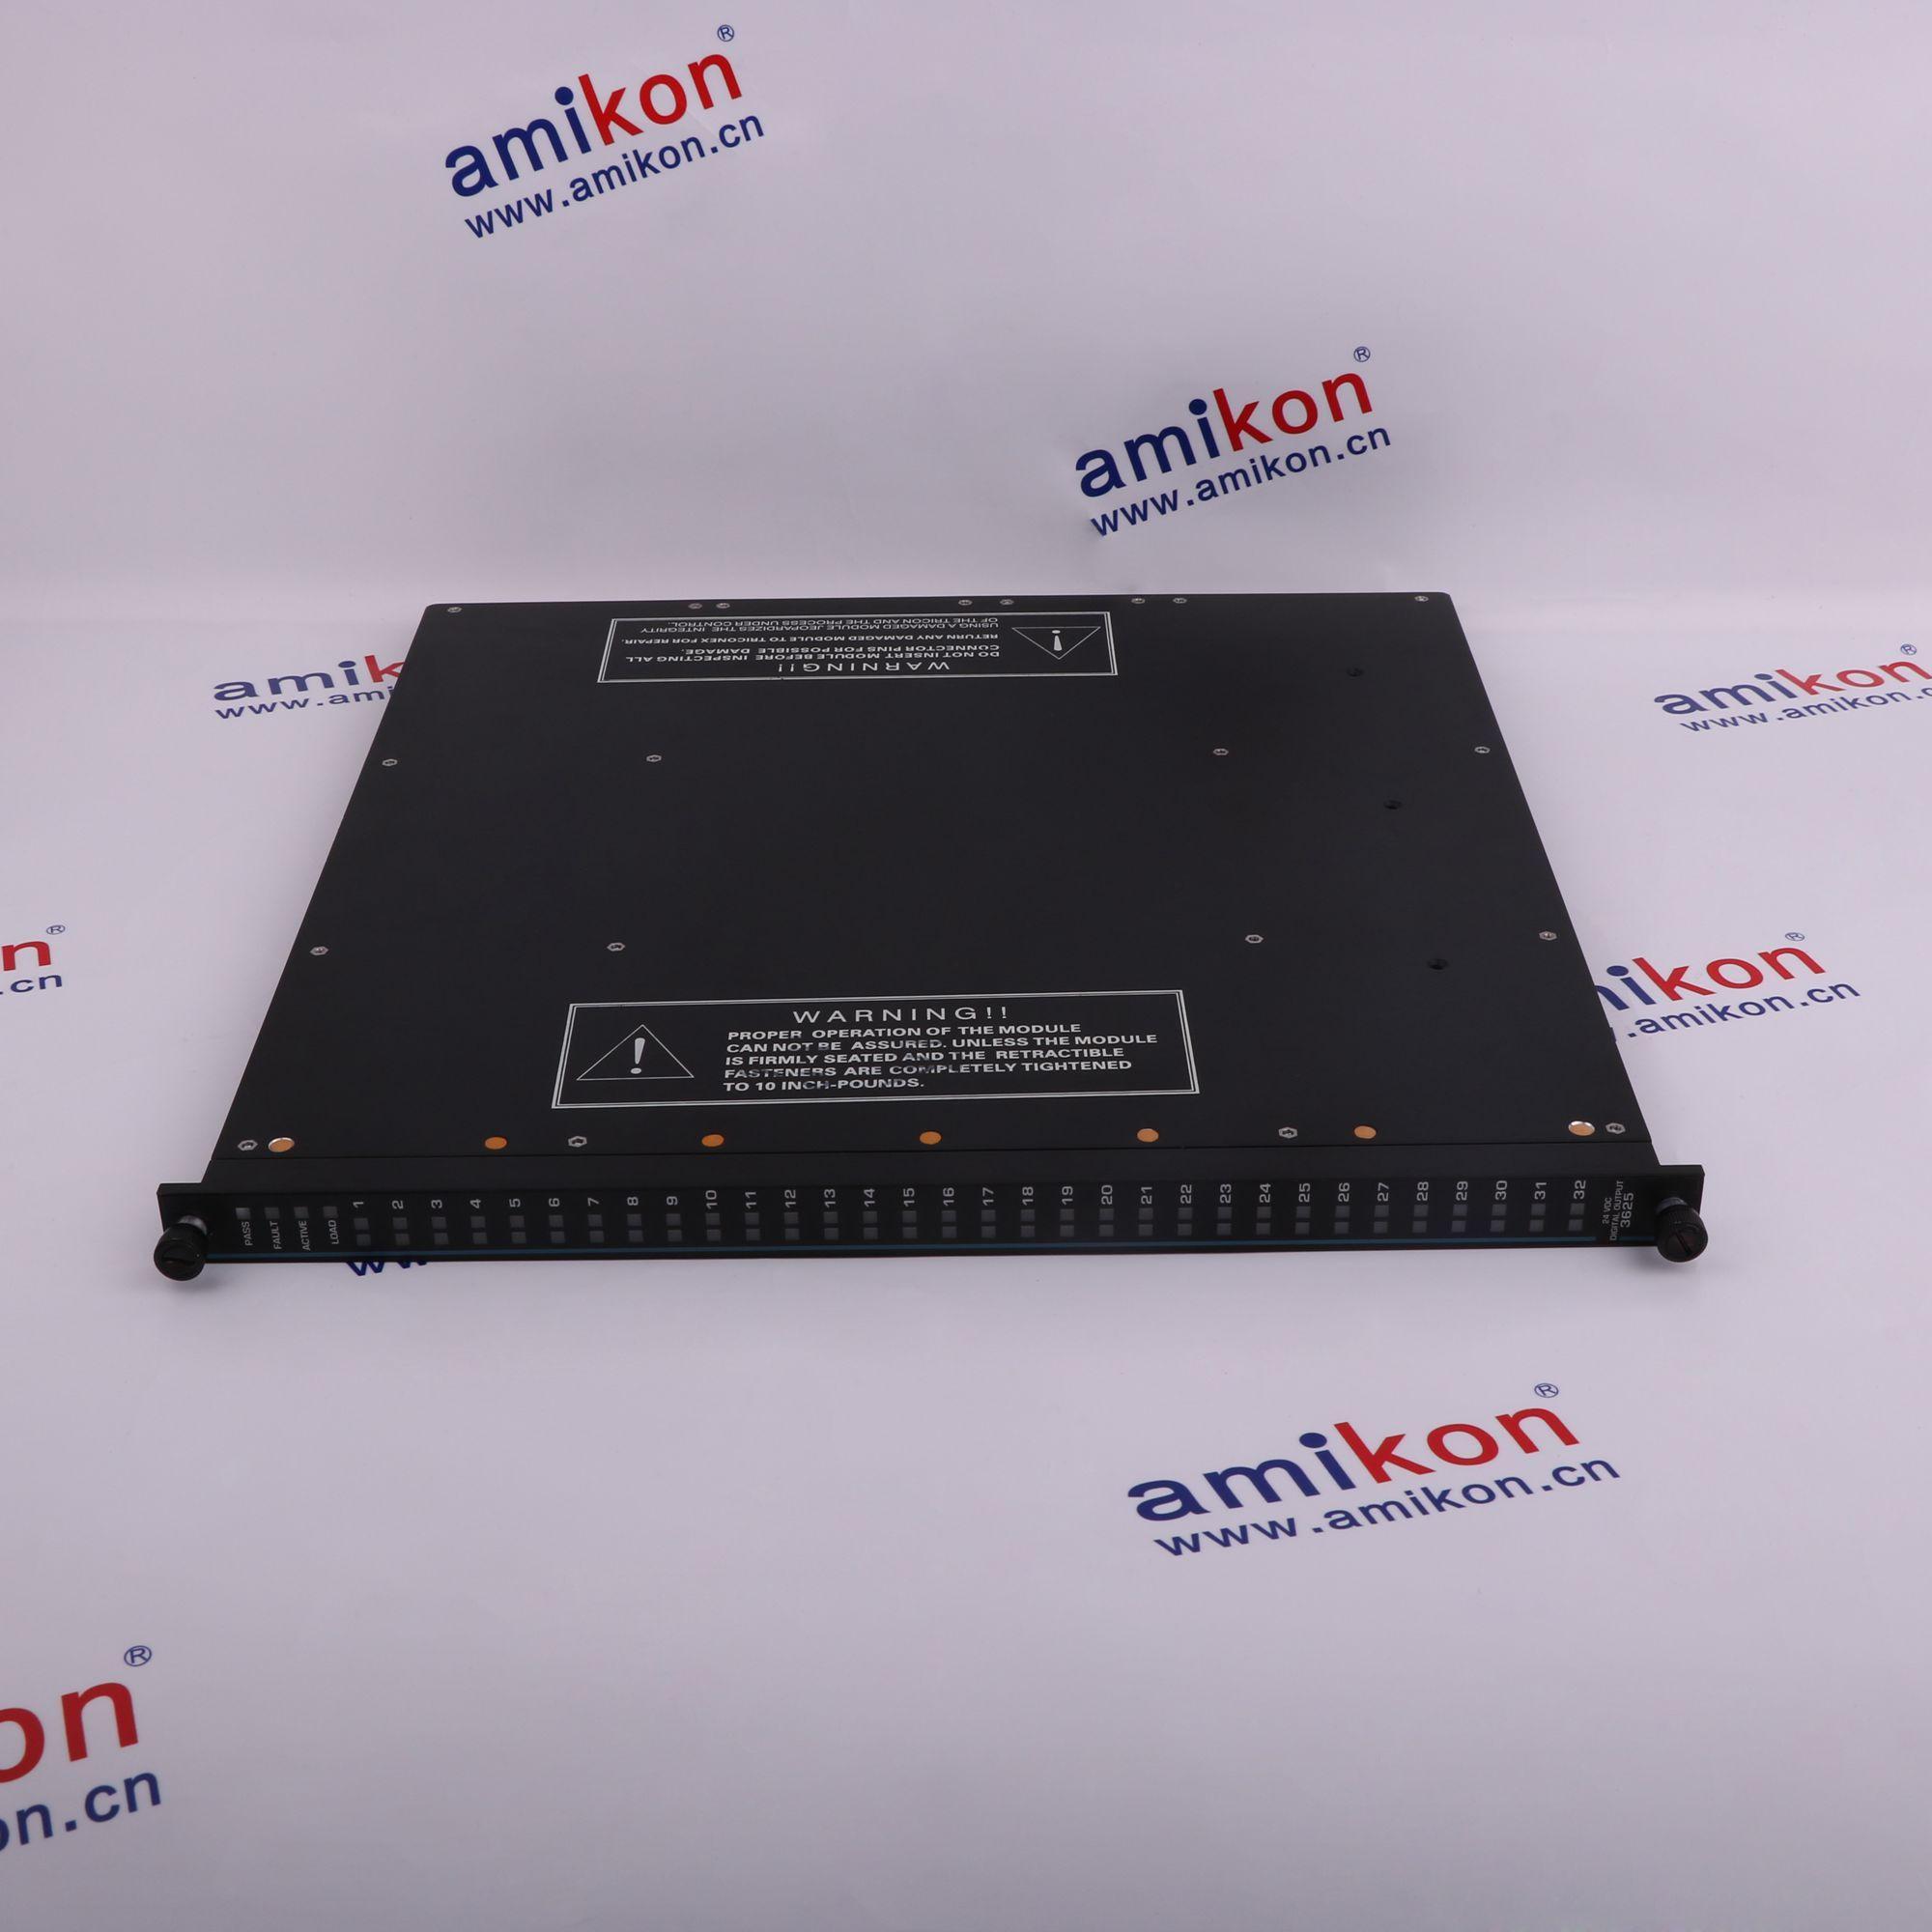 TRICONEX TRICON 3607E Digital Output Module, 48VDC, Optically Isolated, Non-commoned, TMR